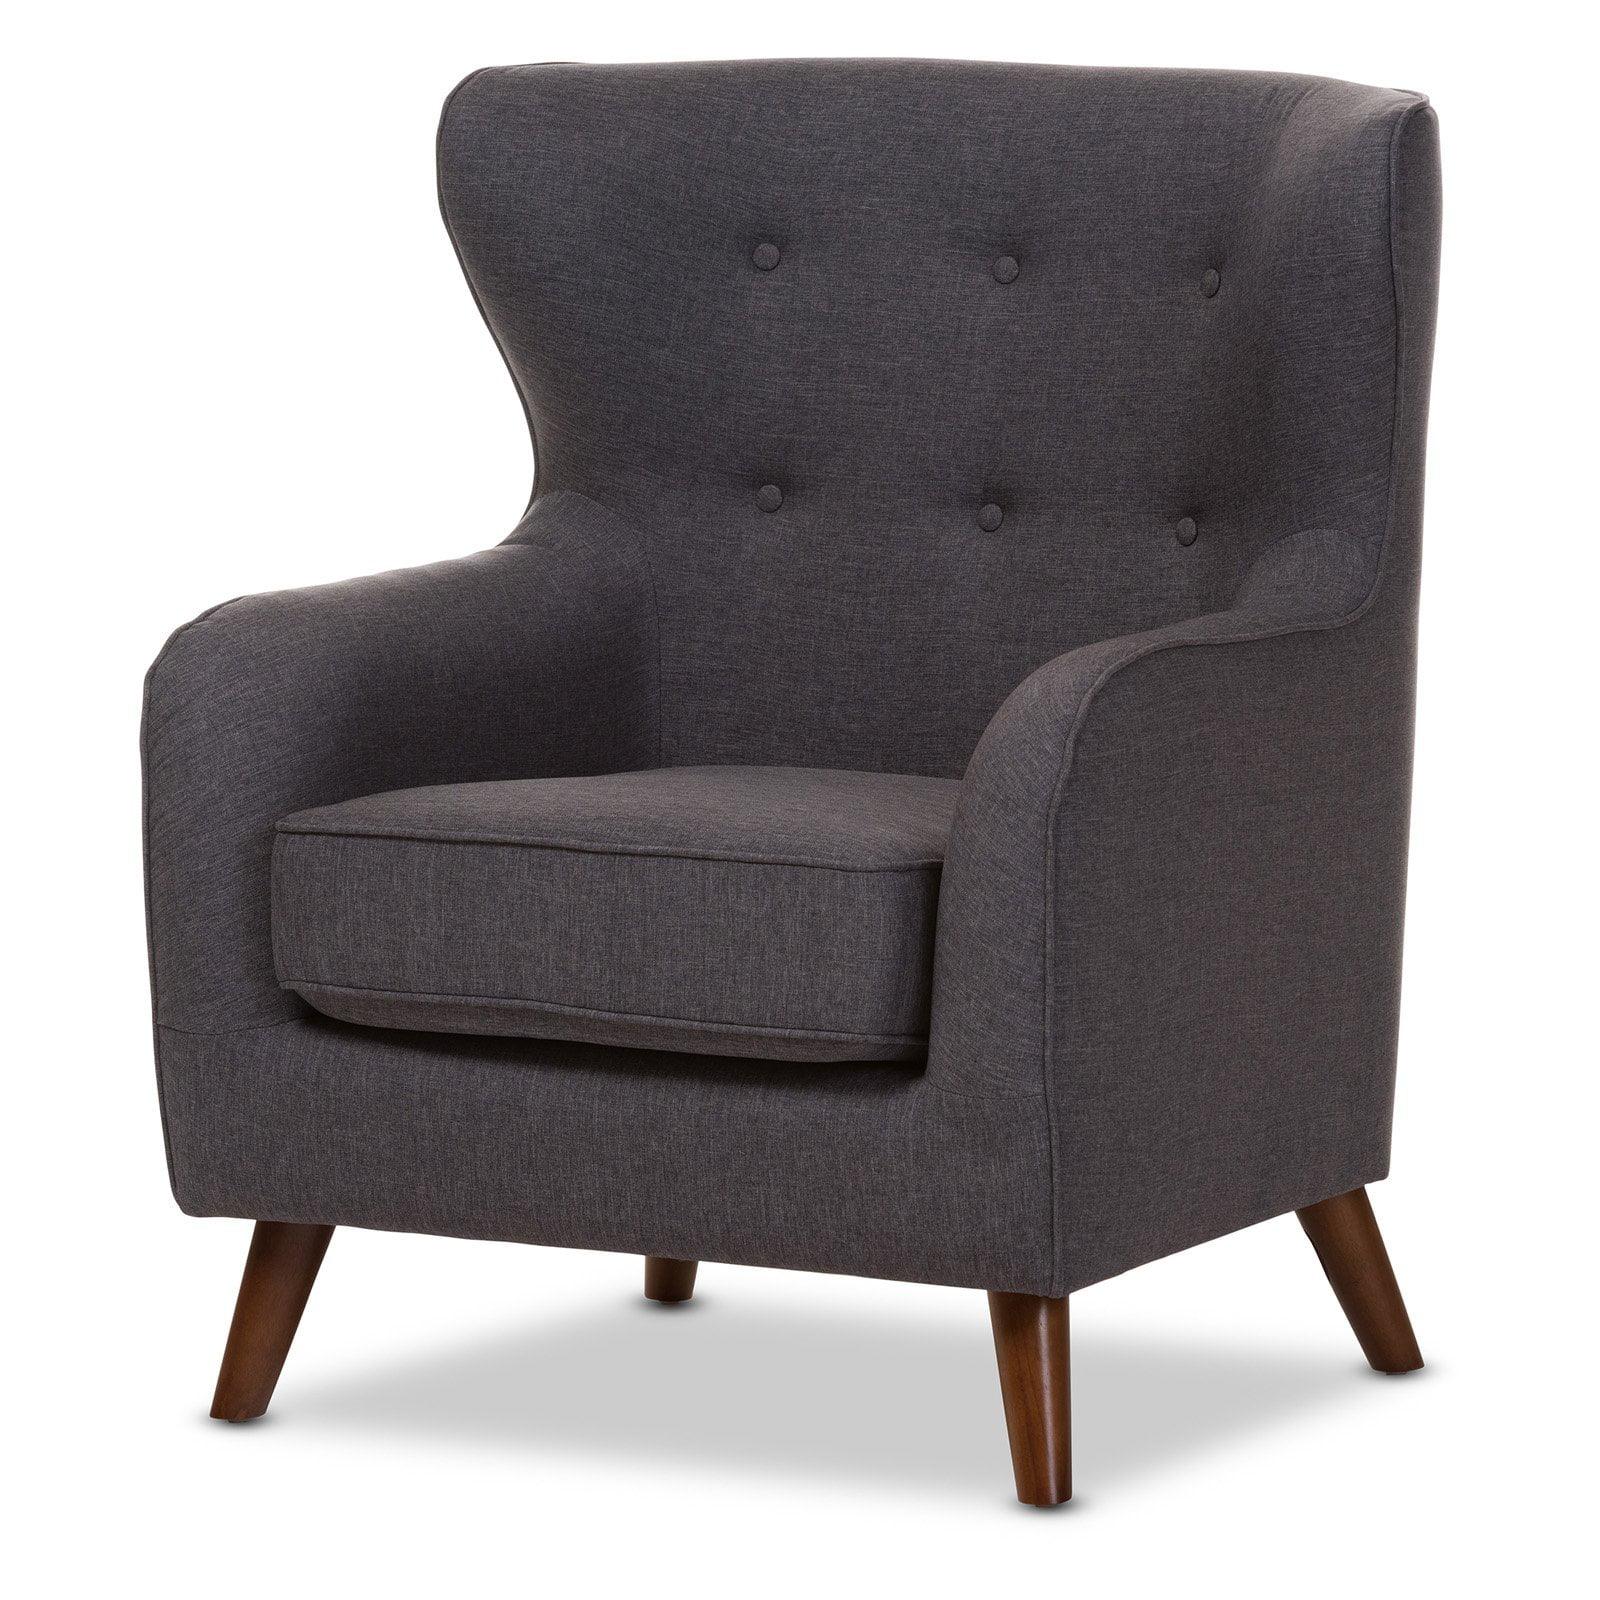 Baxton Studio Ludwig Mid-Century Modern Walnut Finish Button Tufted Upholstered Armchair by Baxton Studio